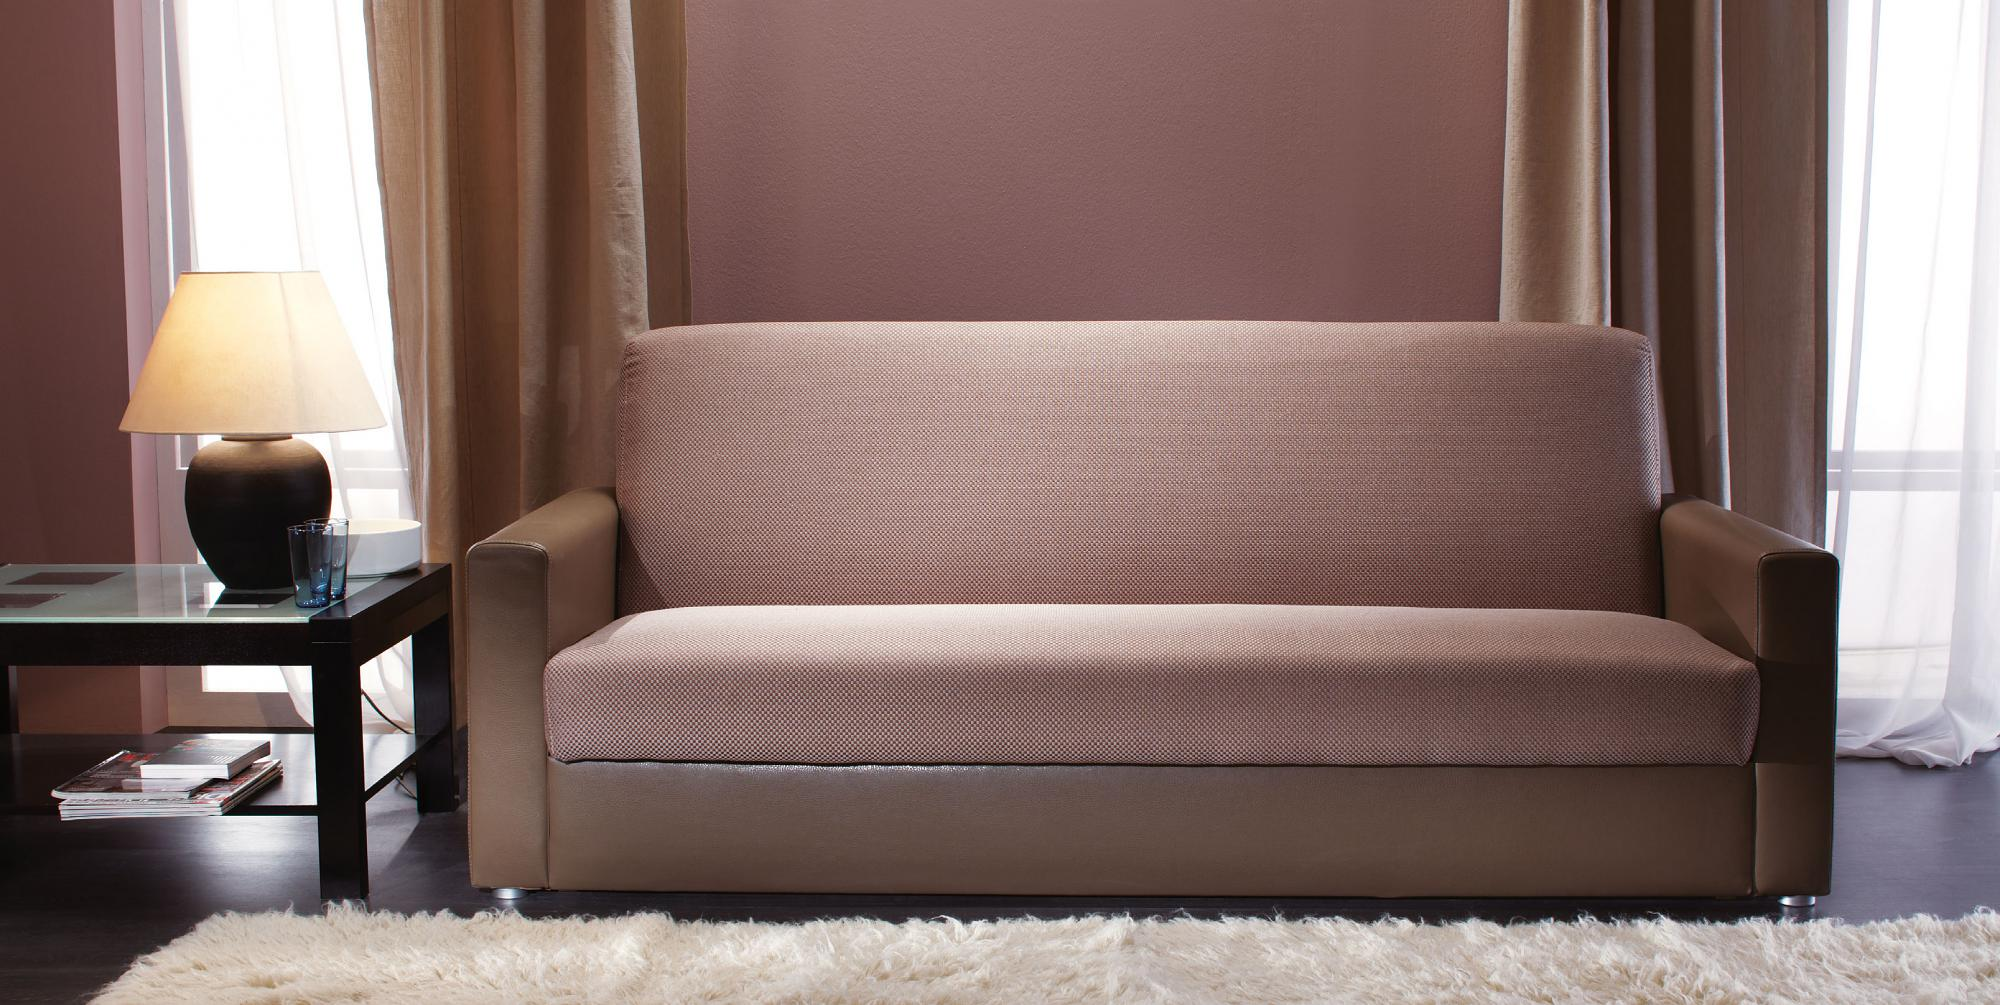 инструкция сборки дивана лорд